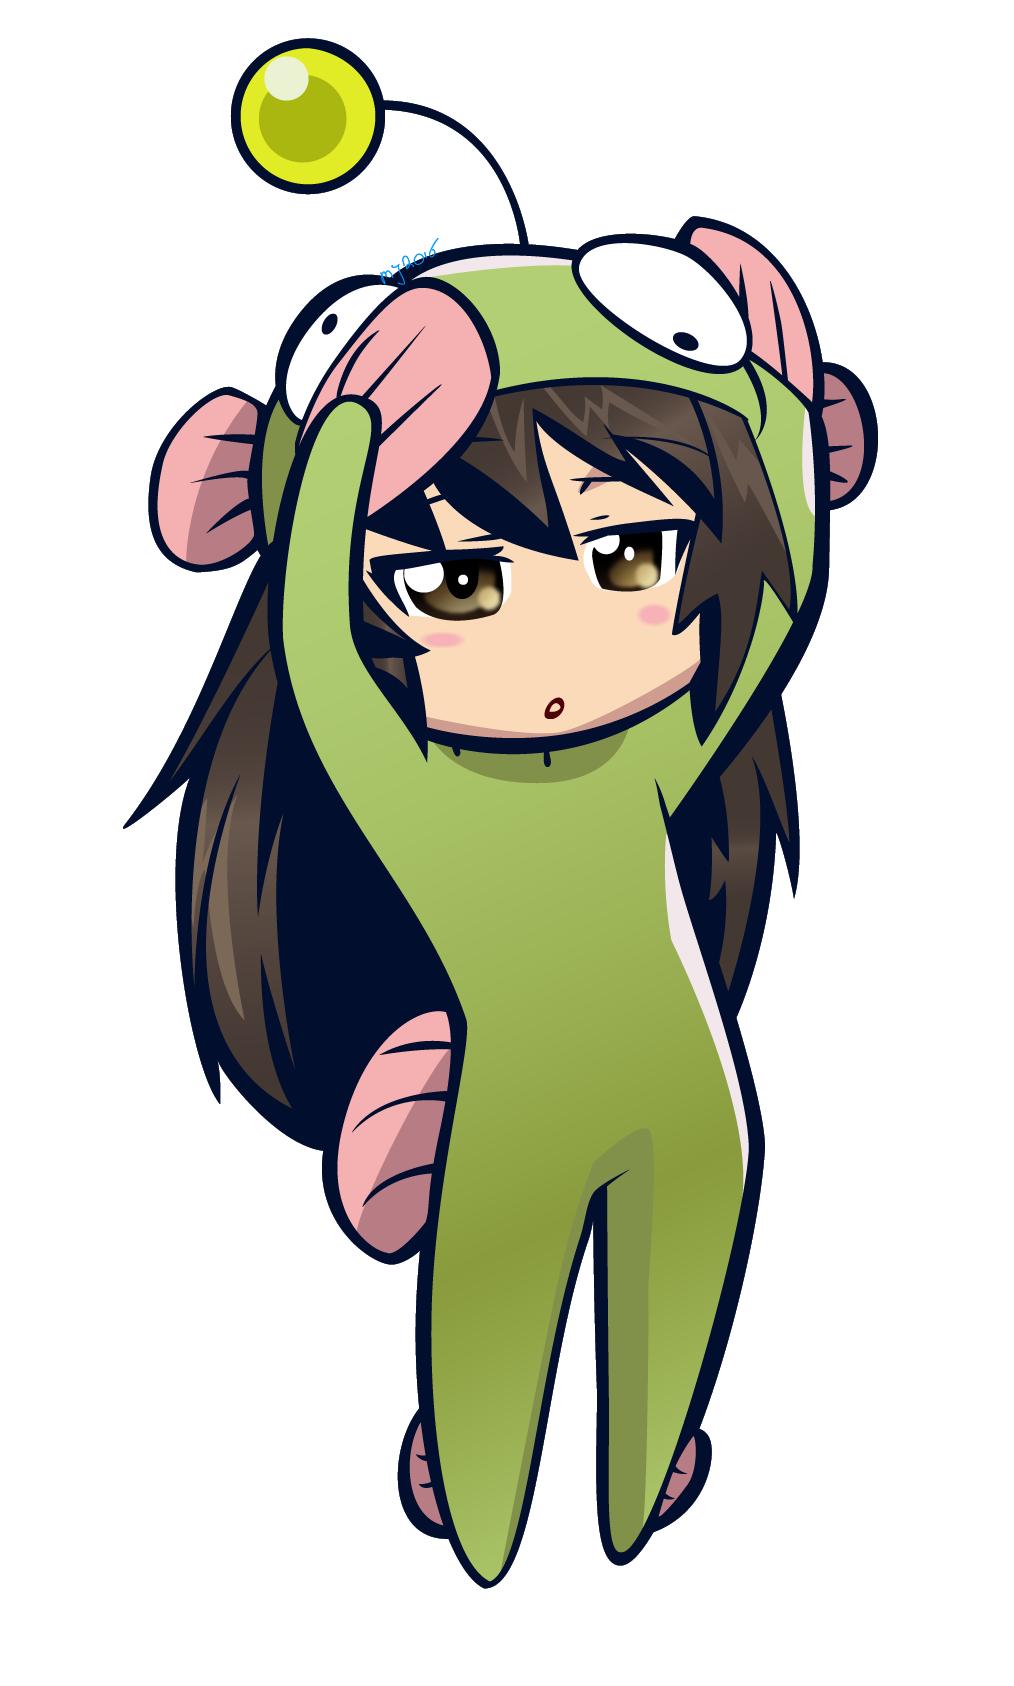 Manga Girl - Adobe Illustrator